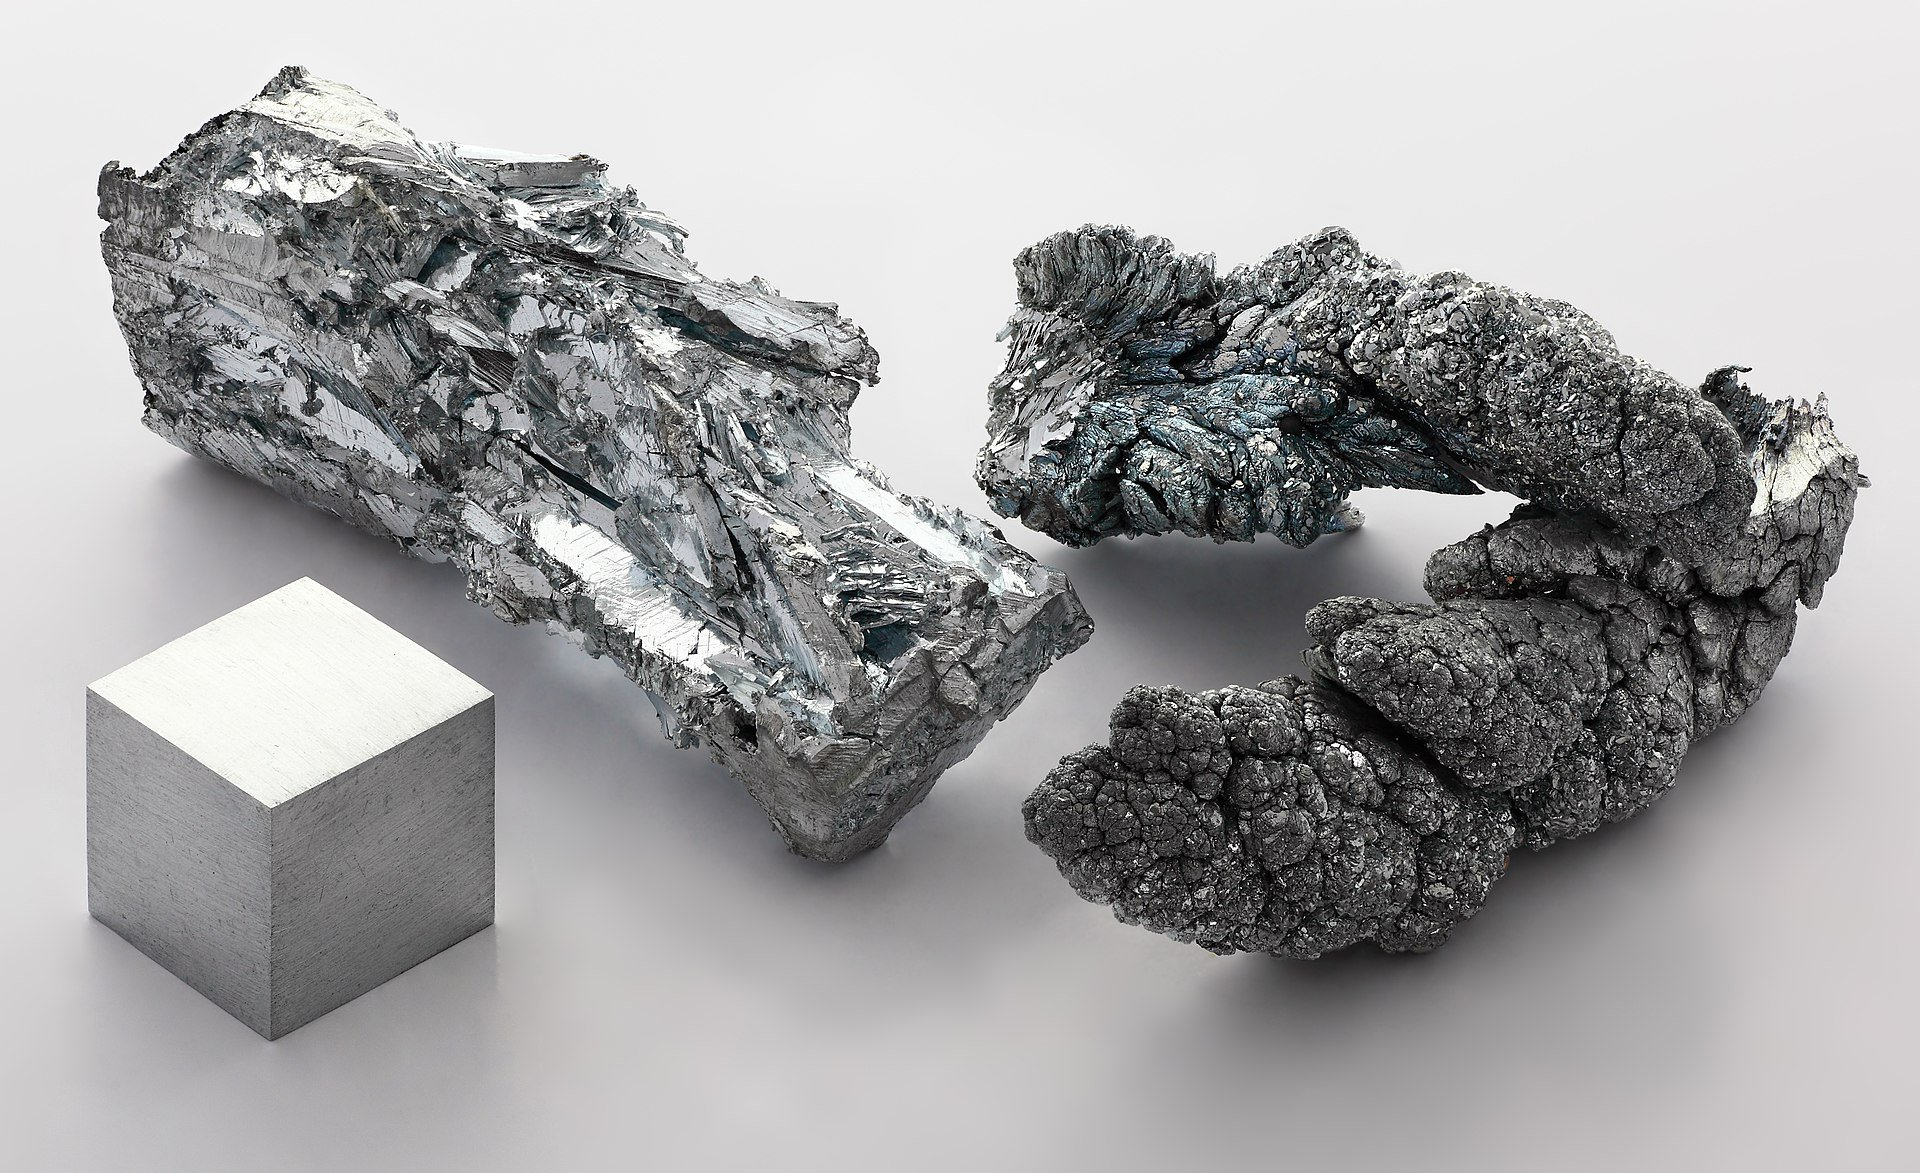 1920px zinc fragment sublimed and 1cm3 cube